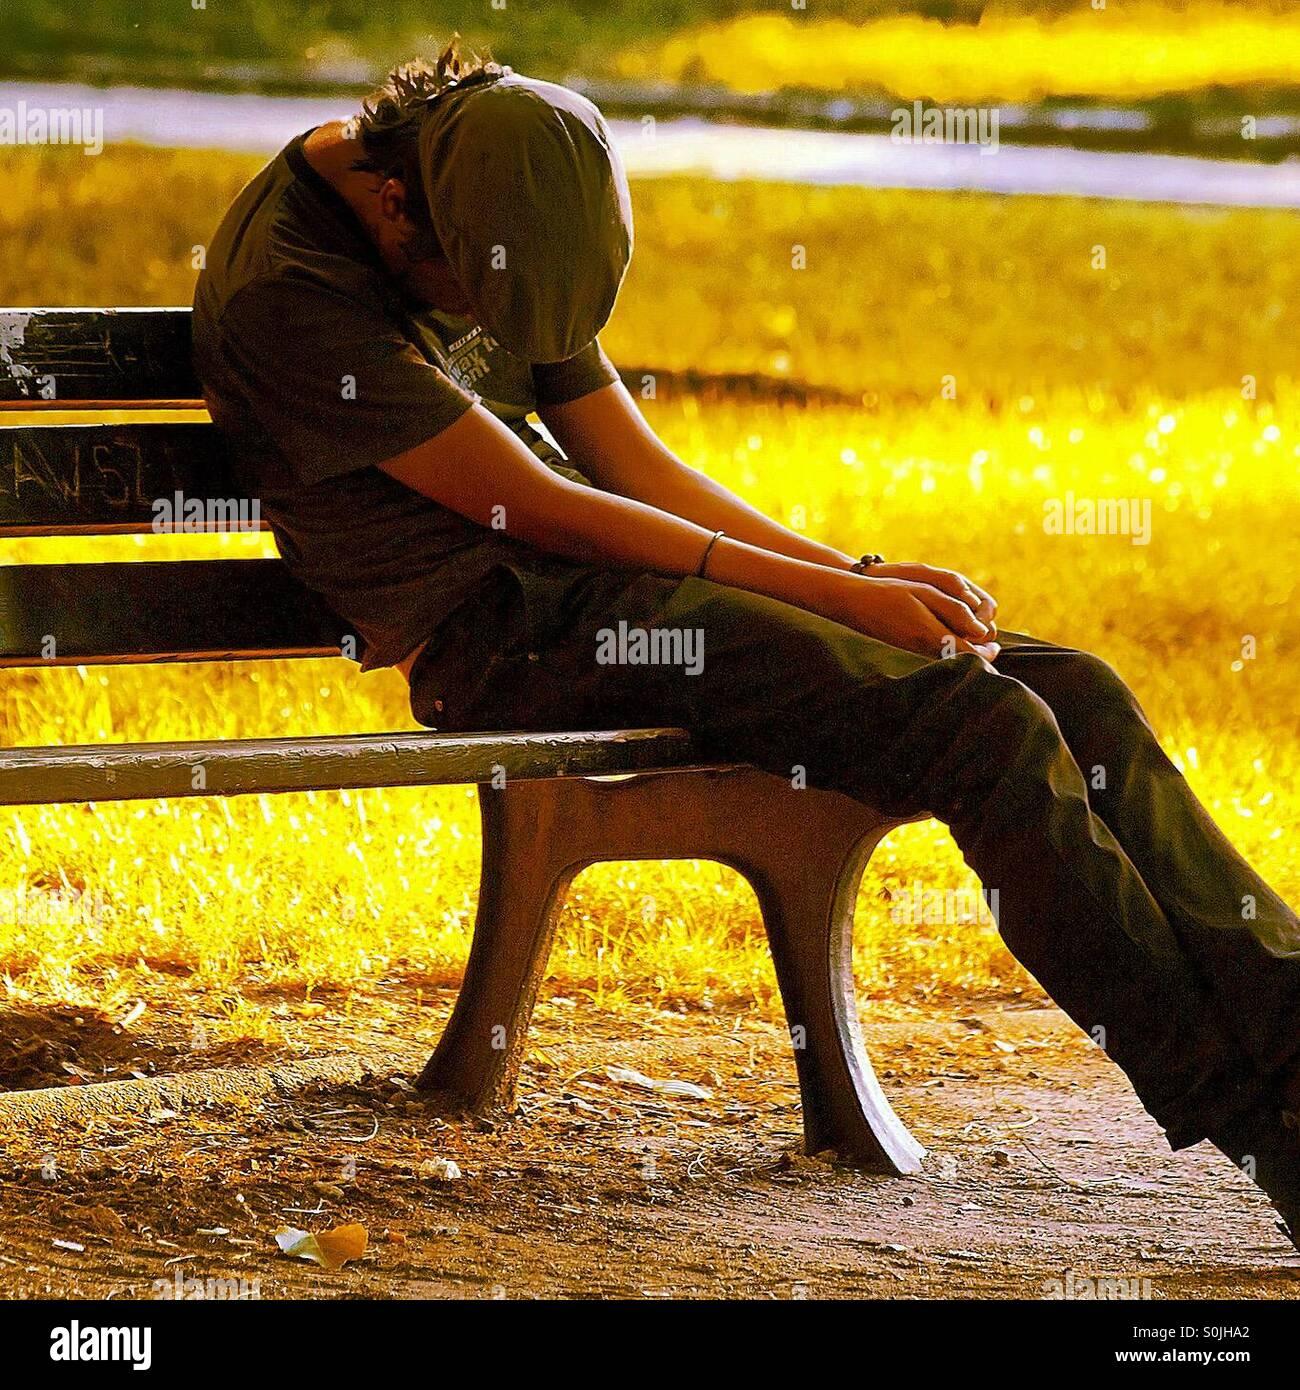 Man sleeping on bench Photo Stock